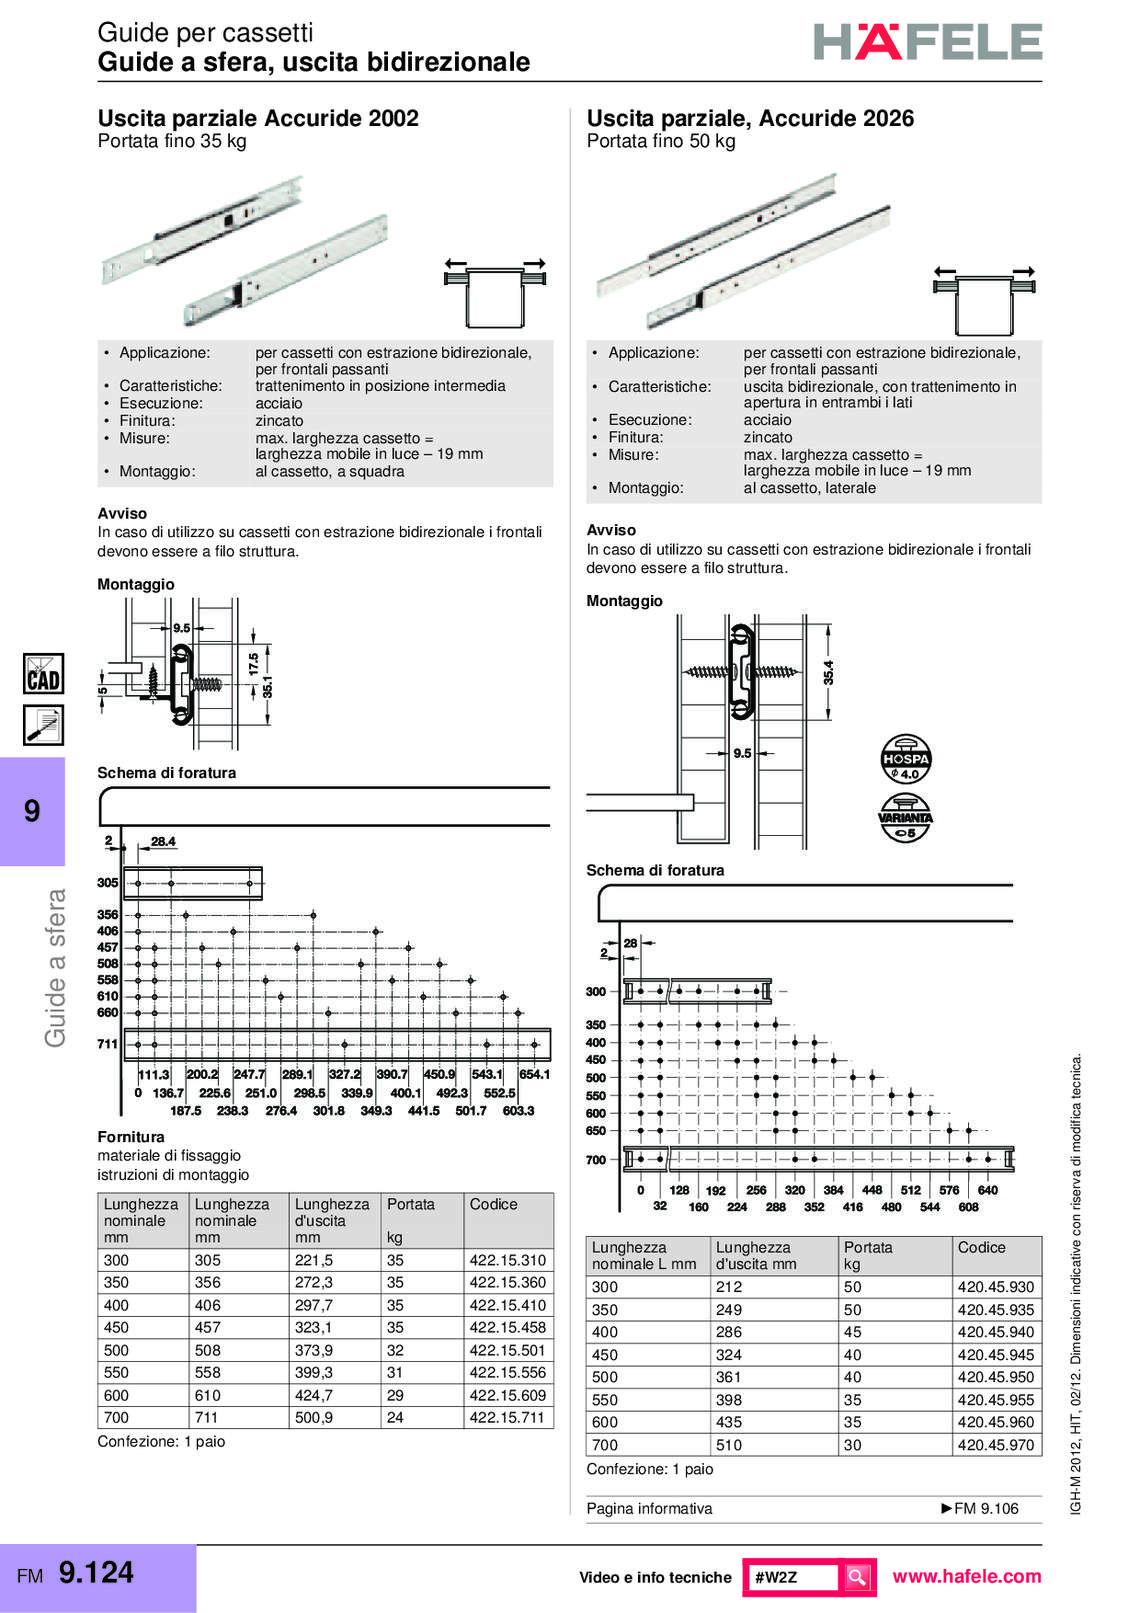 hafele-spondine-e-guide-per-mobili_40_177.jpg